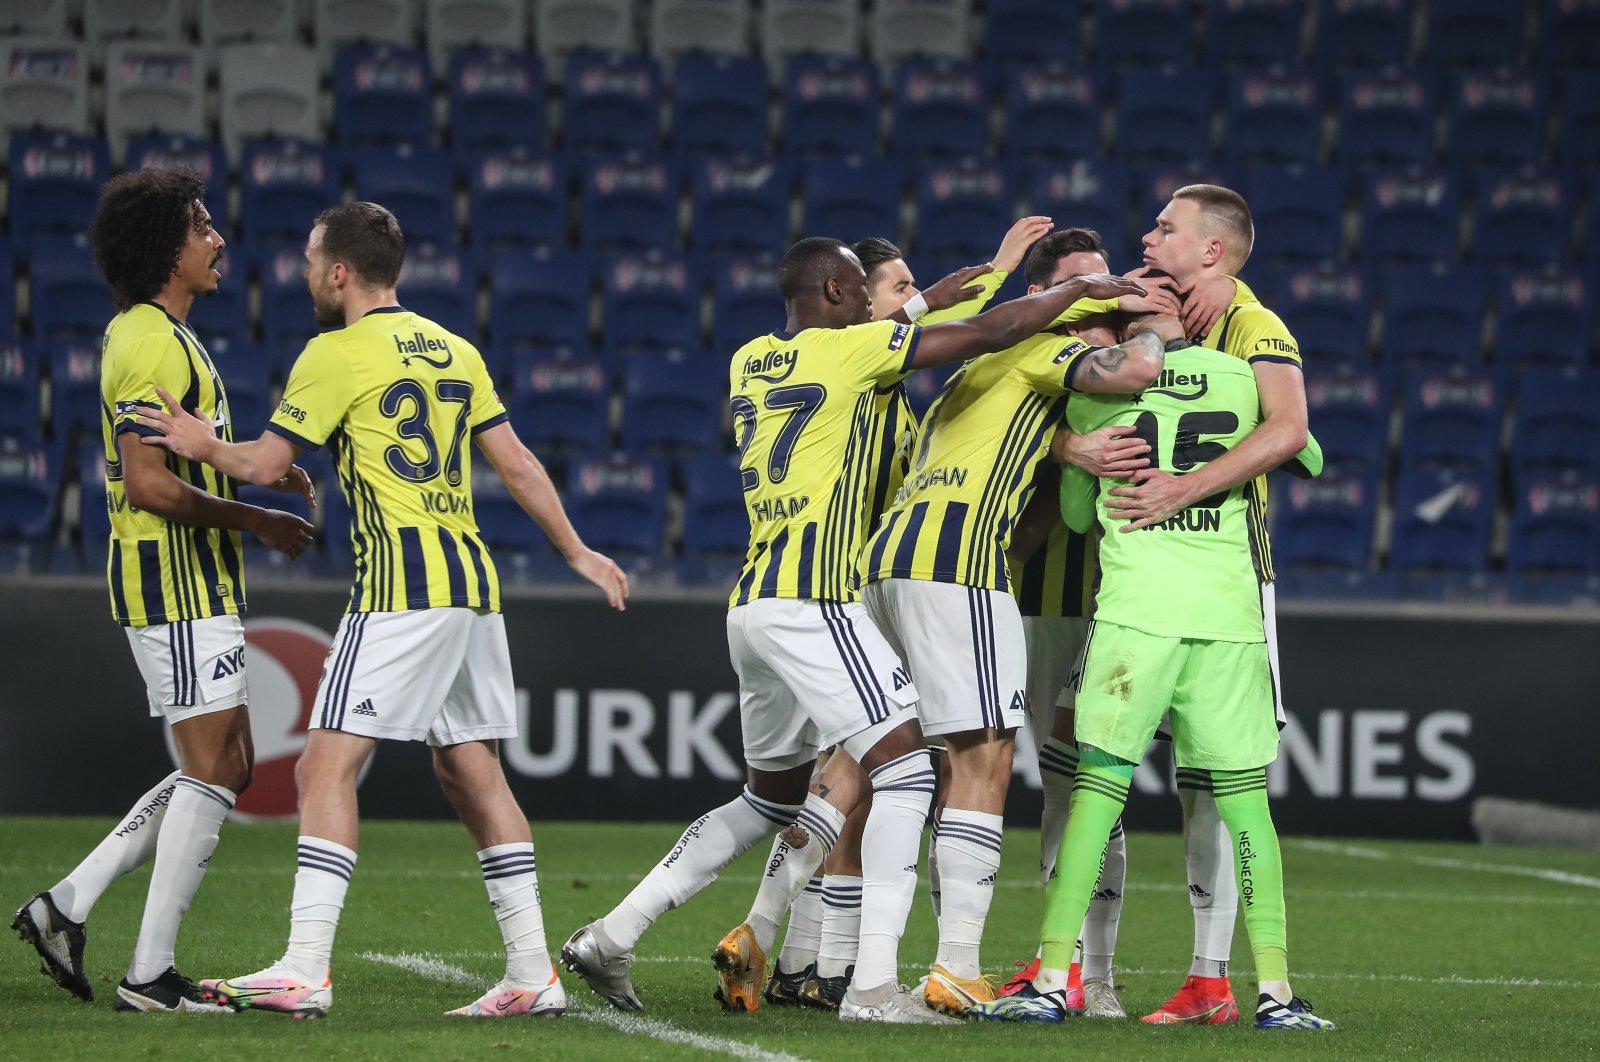 Photo shows Fenerbahçe players during the Fenerbahçe-Başakşehir game in Istanbul, Turkey, April 18, 2021. (DHA Photo)